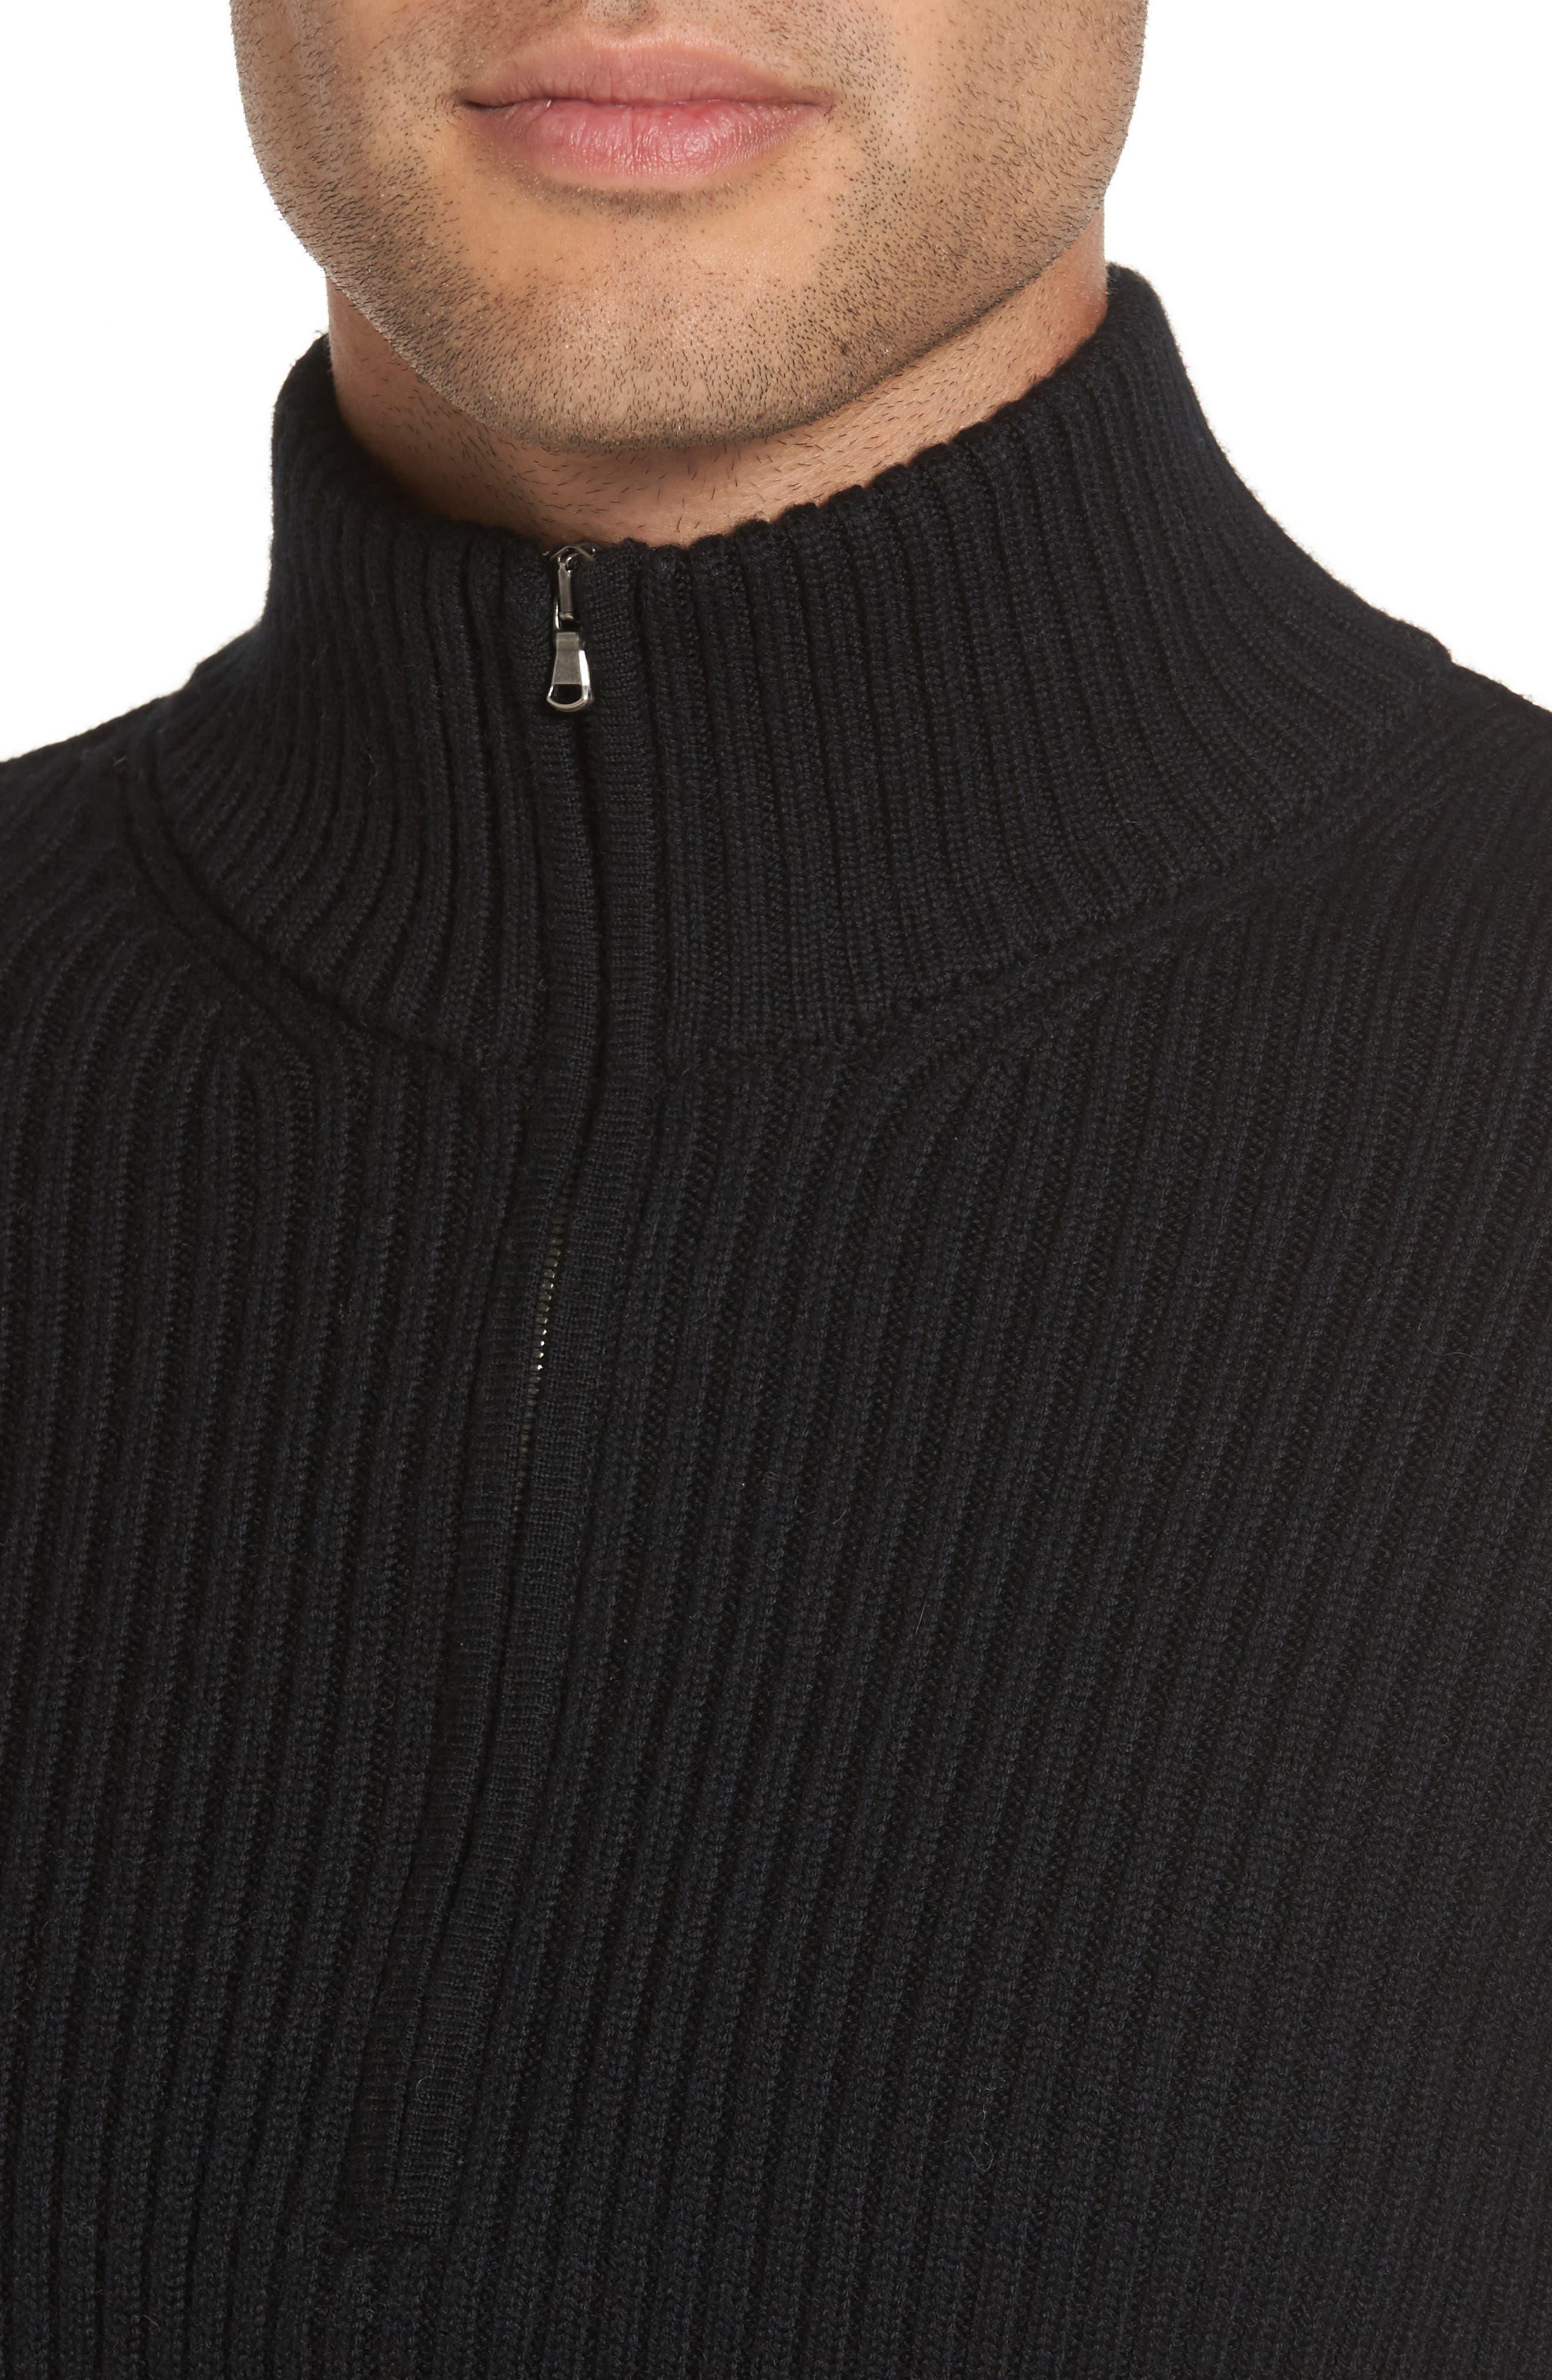 Ribbed Quarter Zip Mock Neck Sweater,                             Alternate thumbnail 4, color,                             001